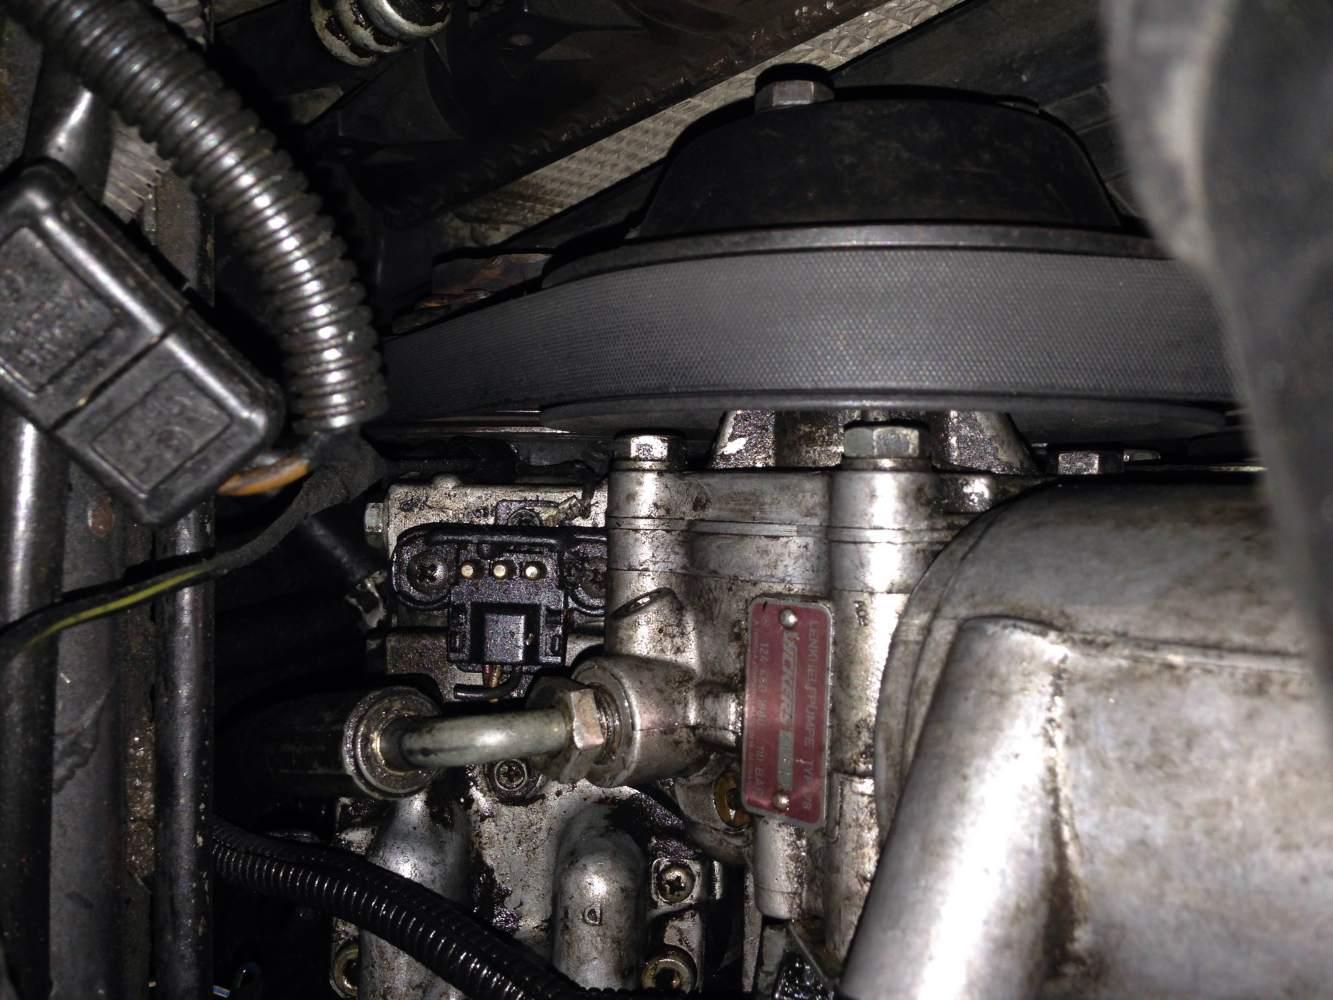 medium resolution of w124 ac wiring diagram climate control air conditioning system wiring mbworld org forumsrh